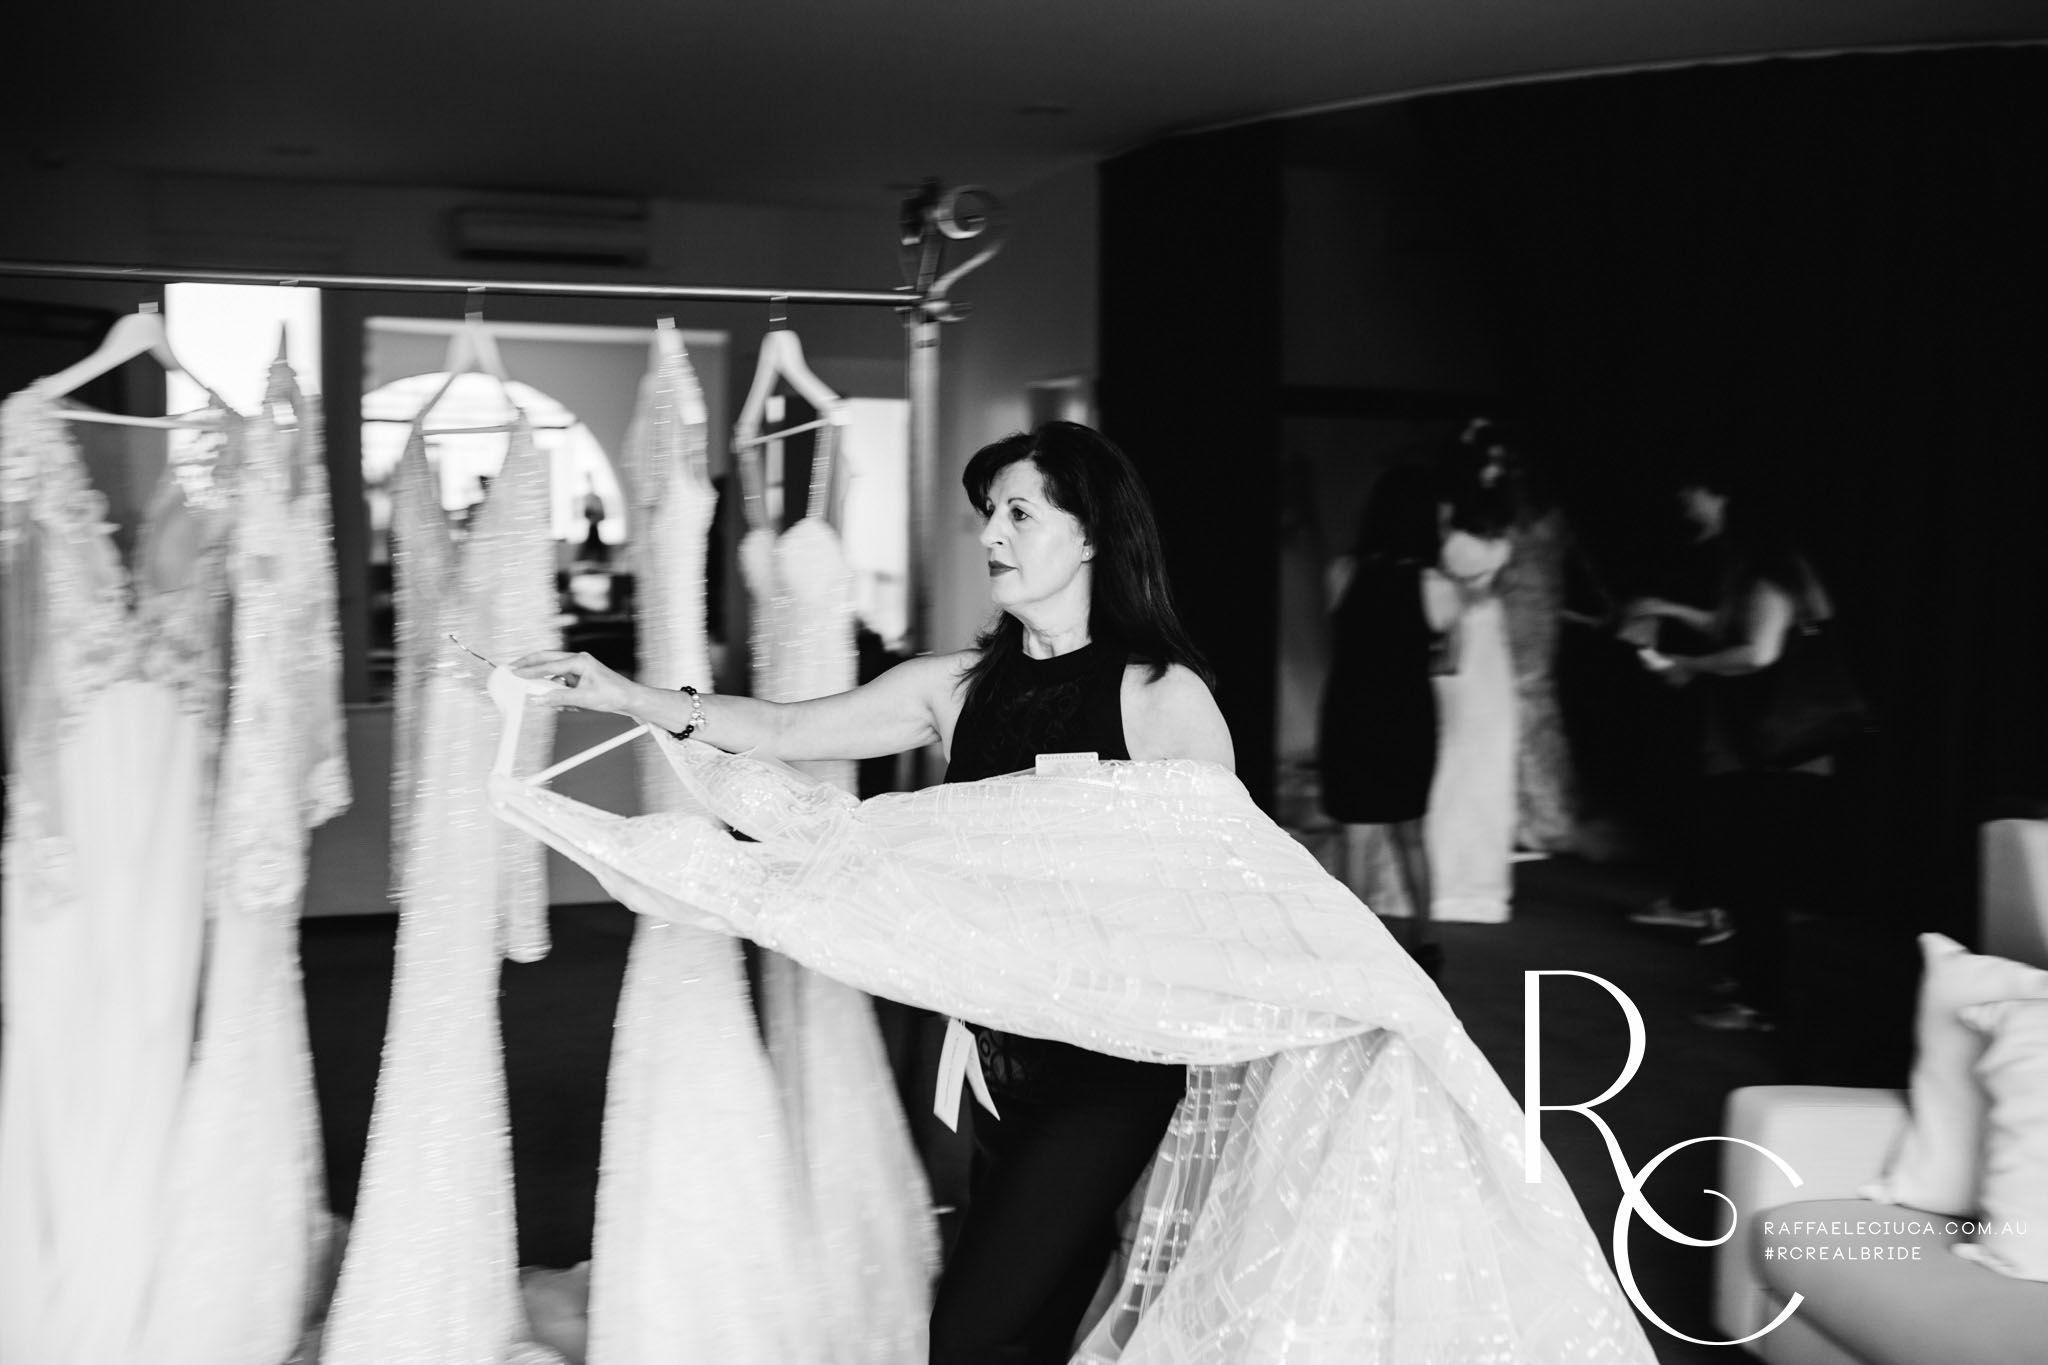 Berta Bridal Wedding Dresses At Raffaele Ciuca In Melbourne